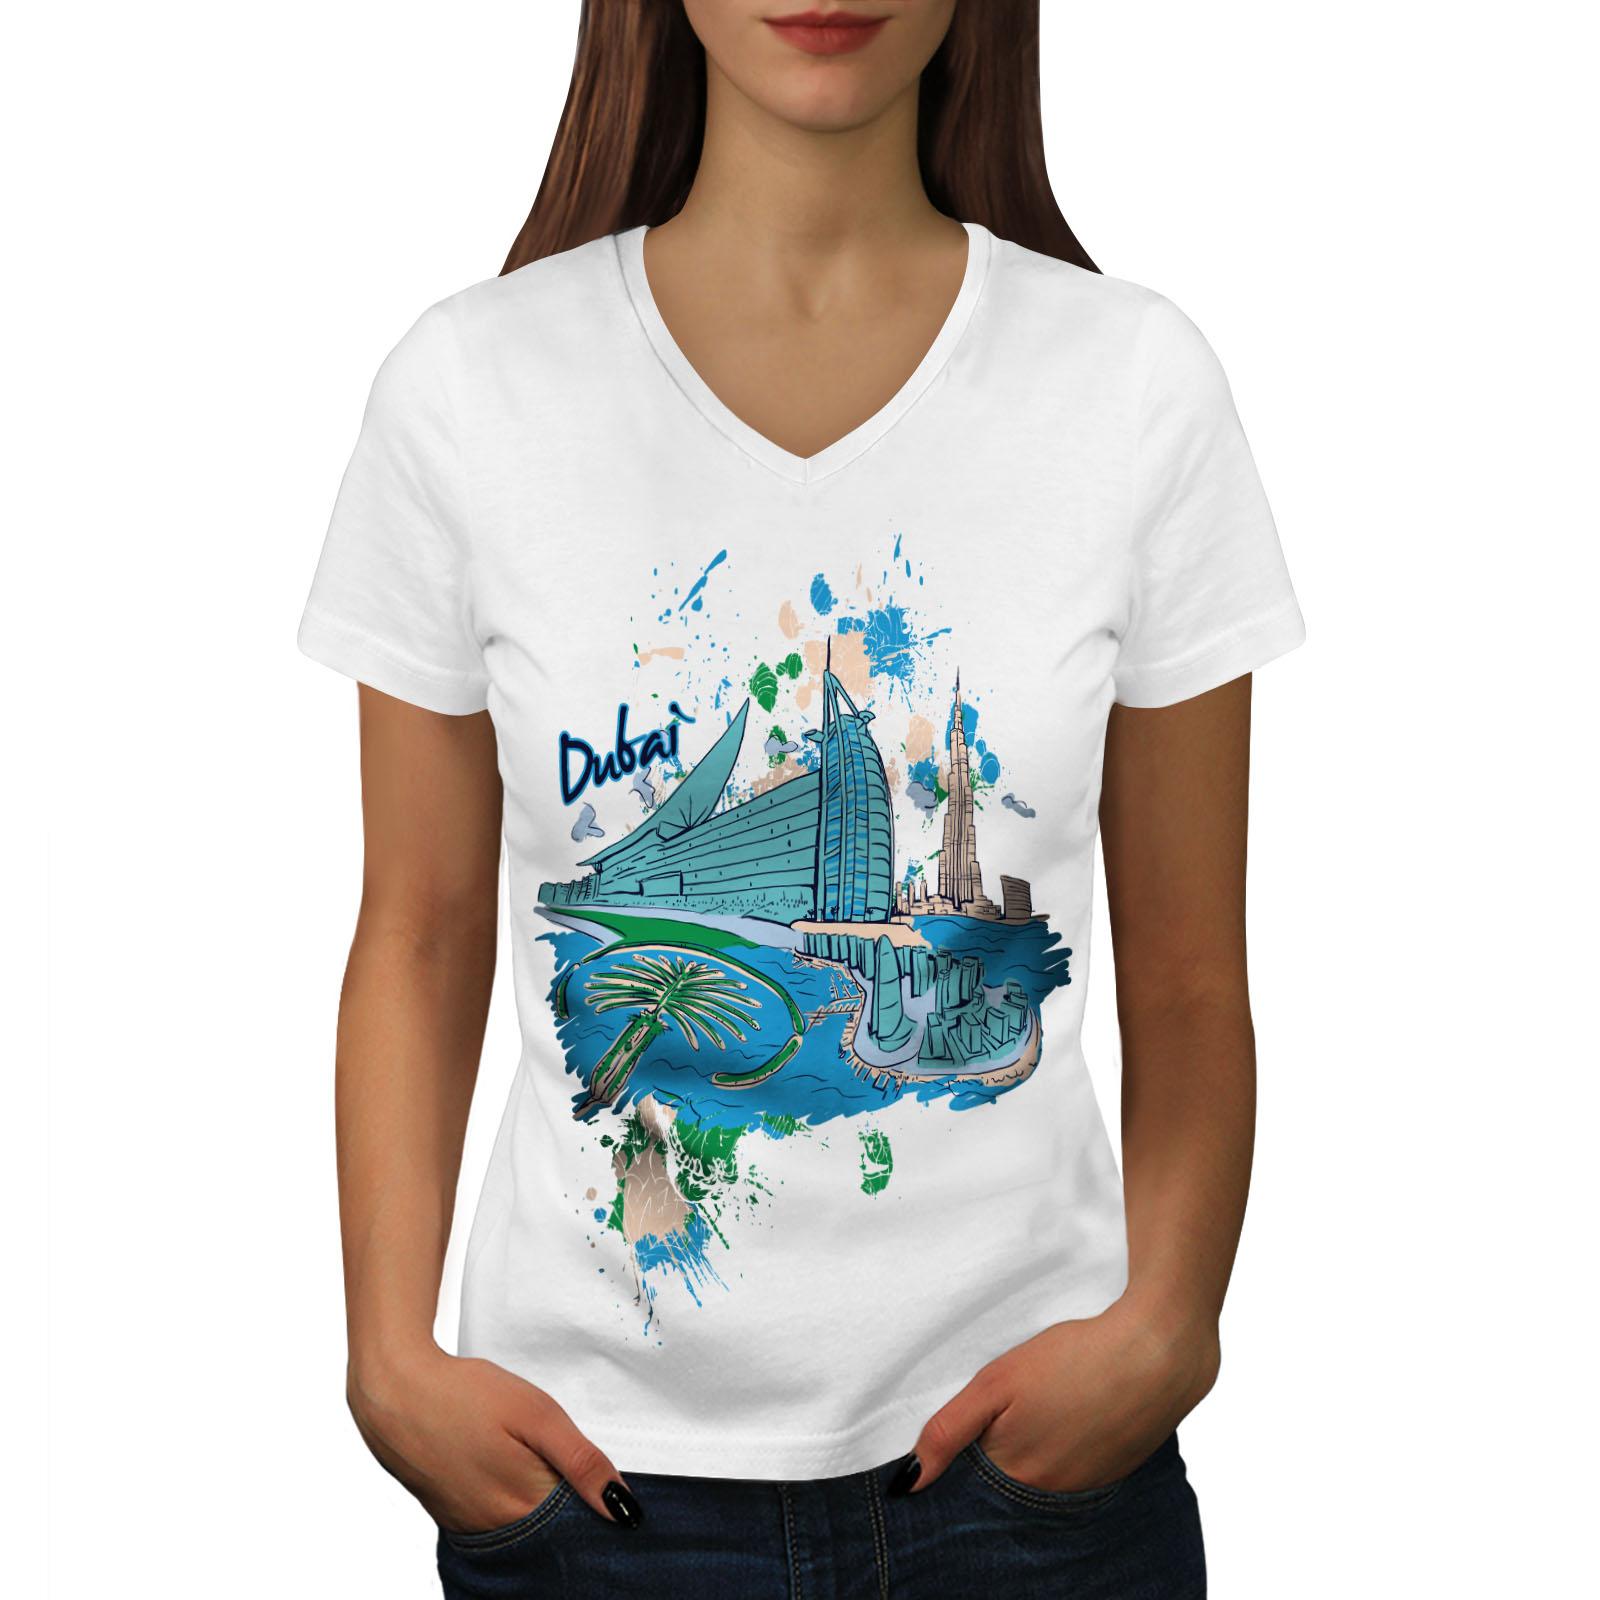 Wellcoda-Dubai-Womens-V-Neck-T-shirt-United-Arab-Graphic-Design-Tee thumbnail 7